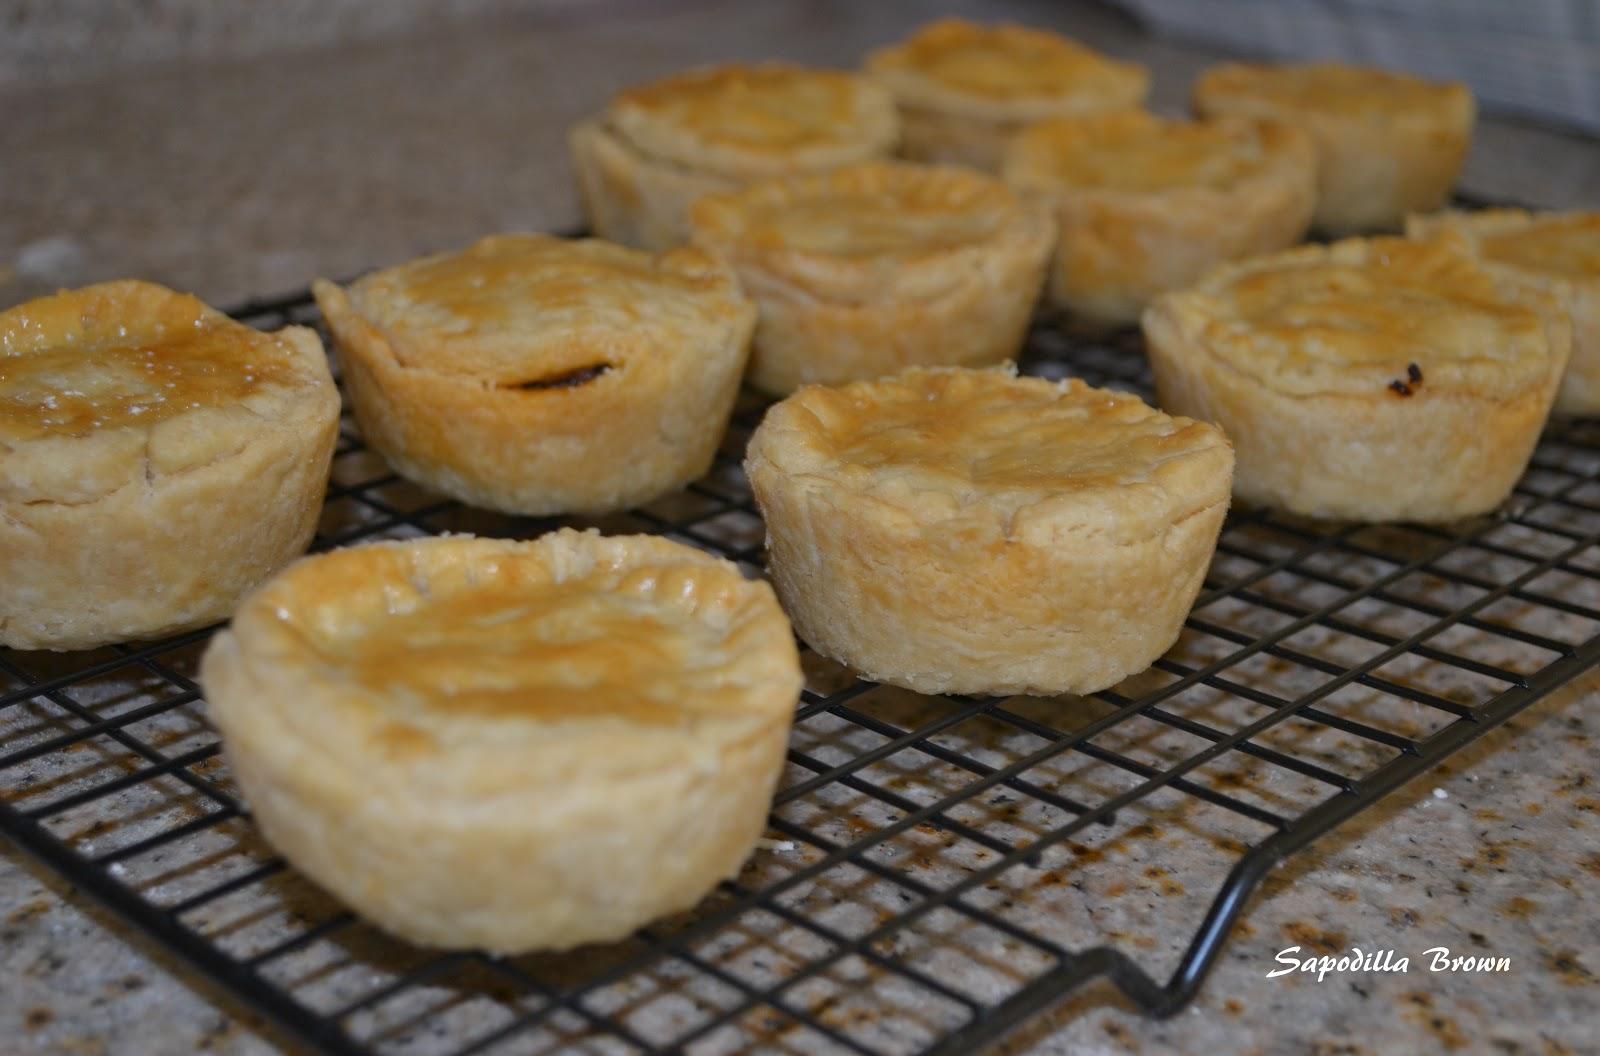 Sapodilla Brown: Guyanese Beef Patties